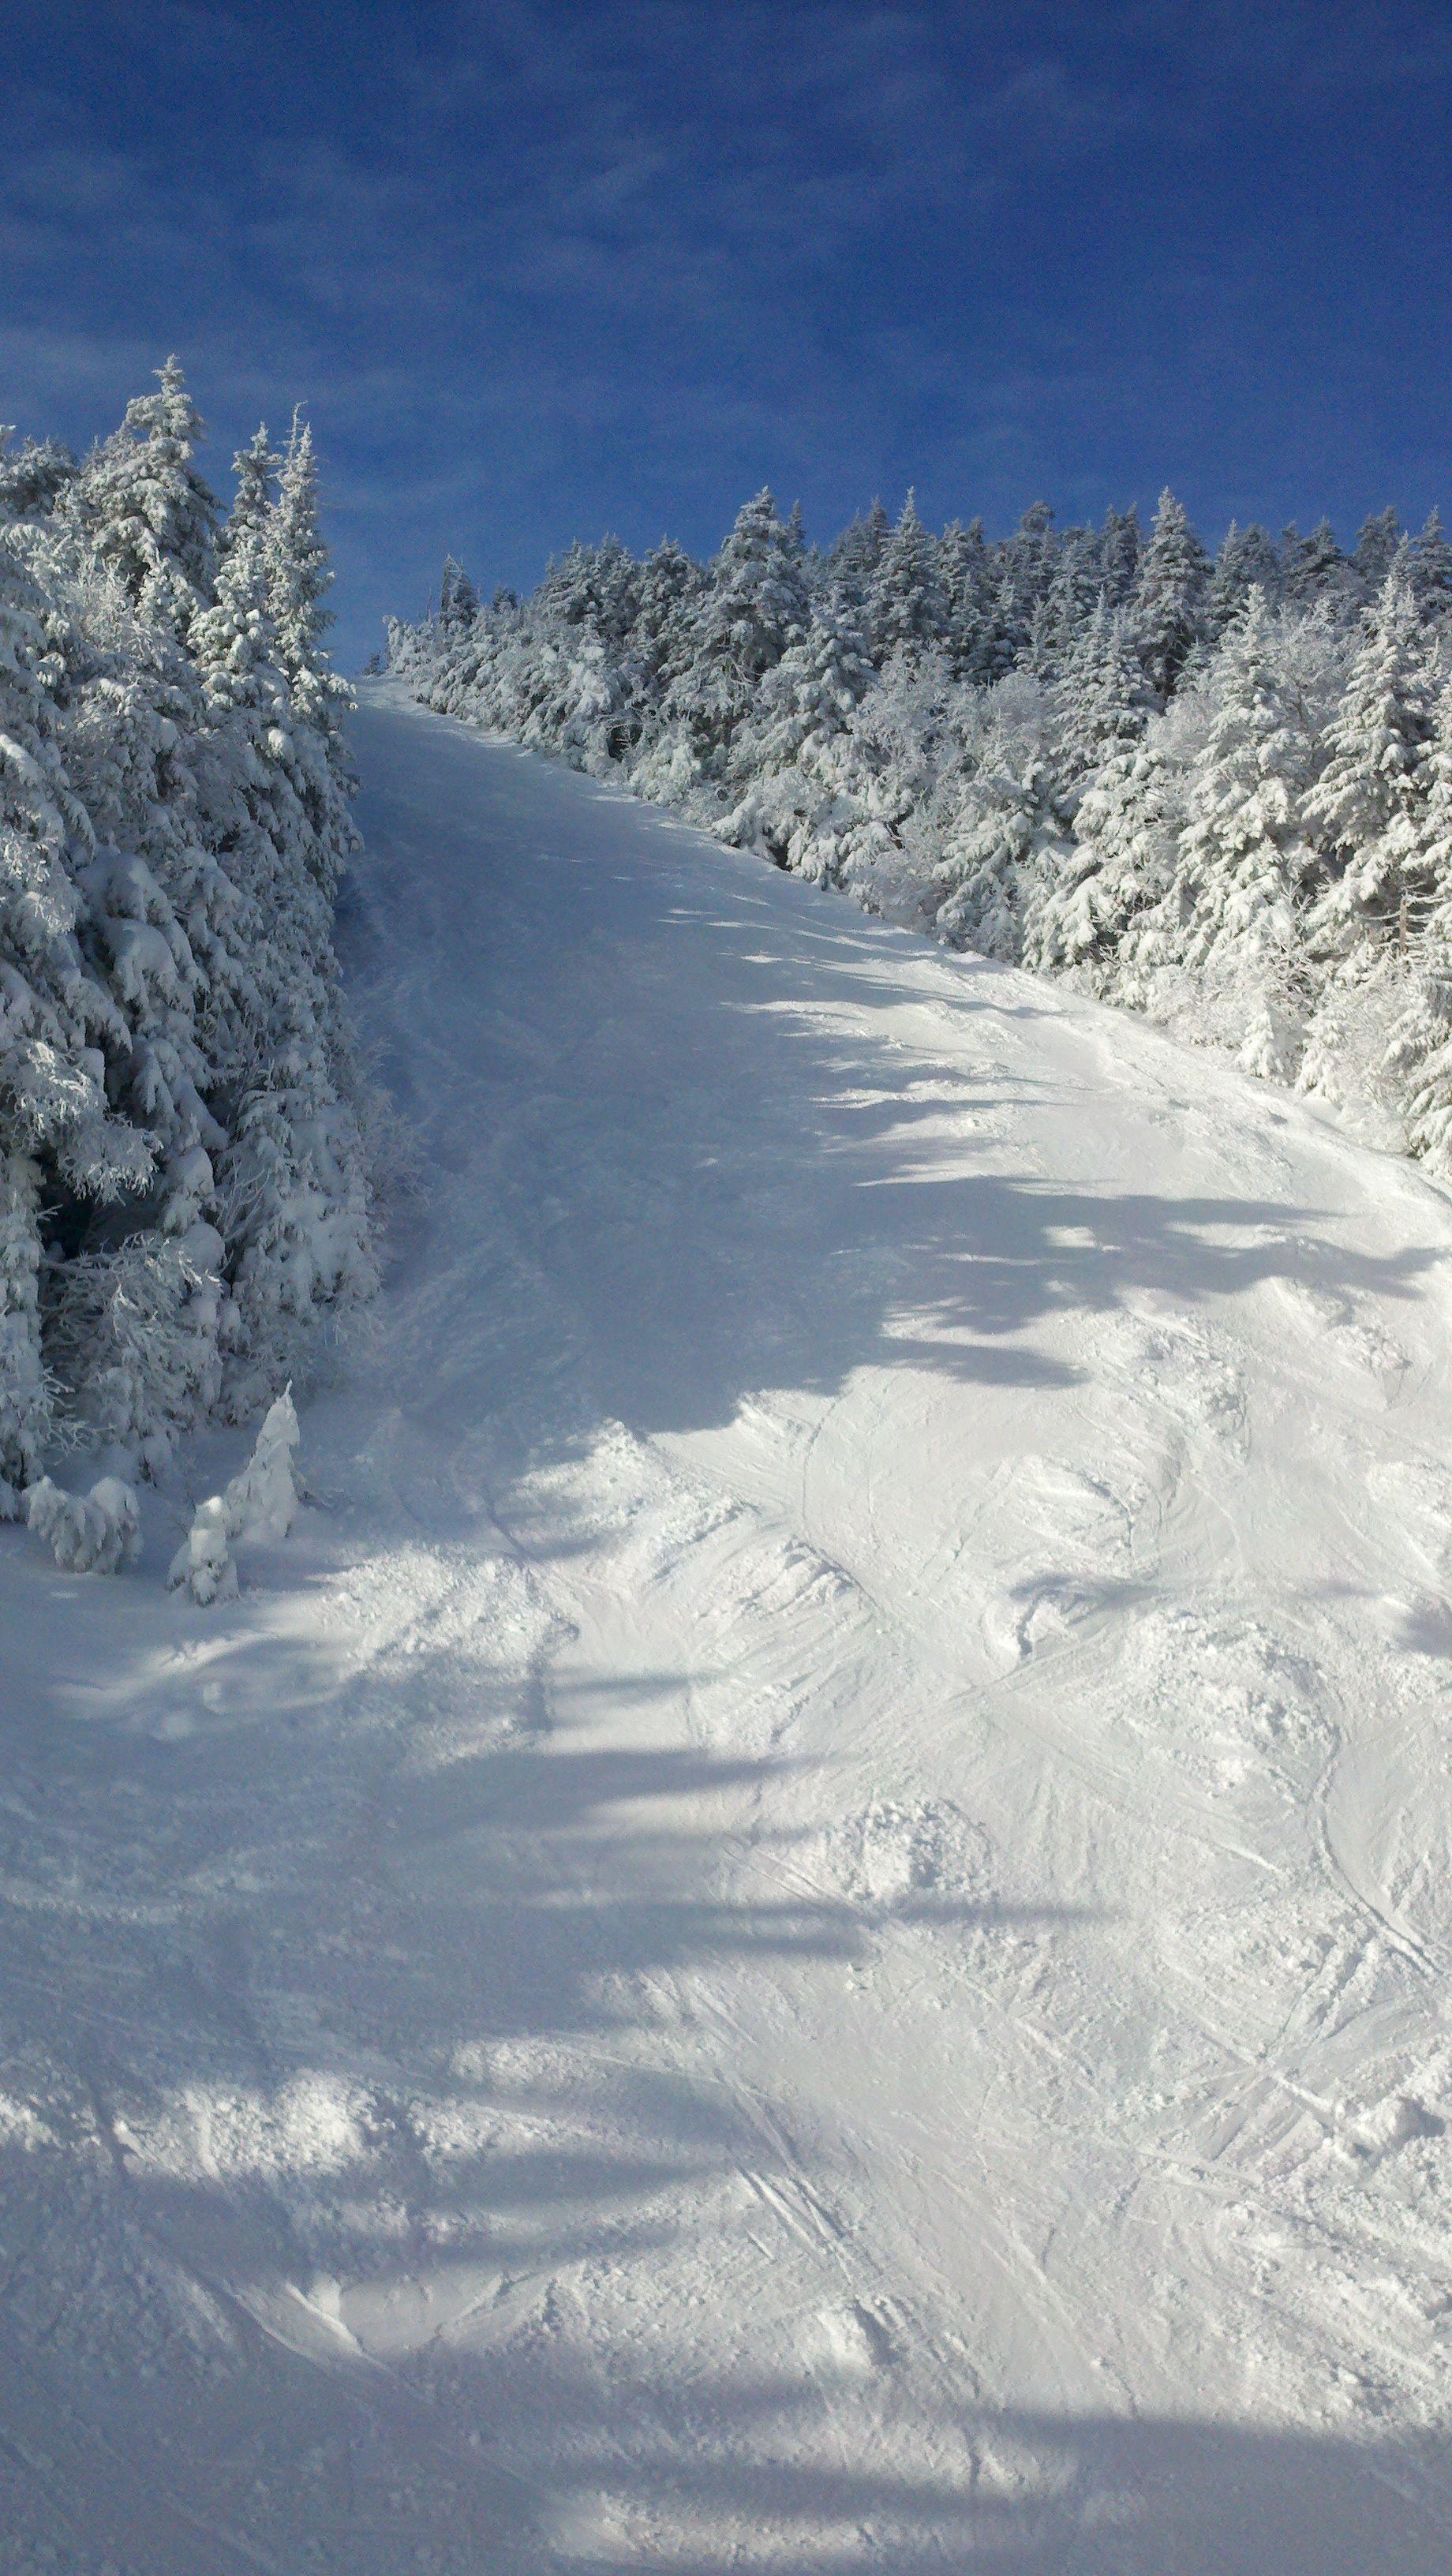 Okemo Mountain Vt Winter Destination Ski Trip National Parks